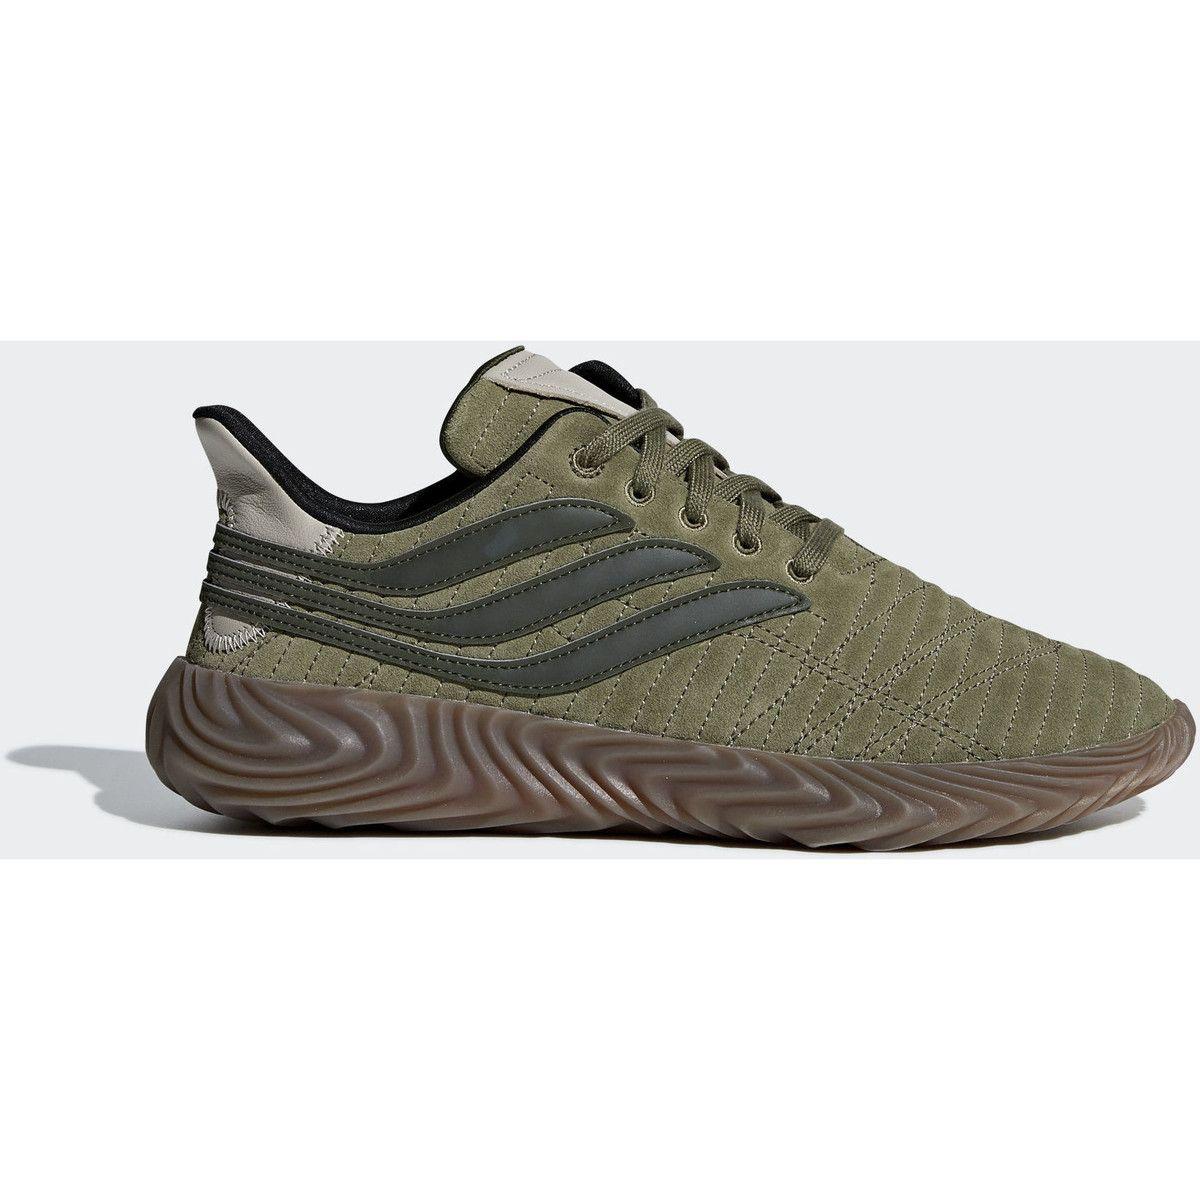 adidas Sobakov Schoenen Lage Sneakers dames. Kleur: Groen